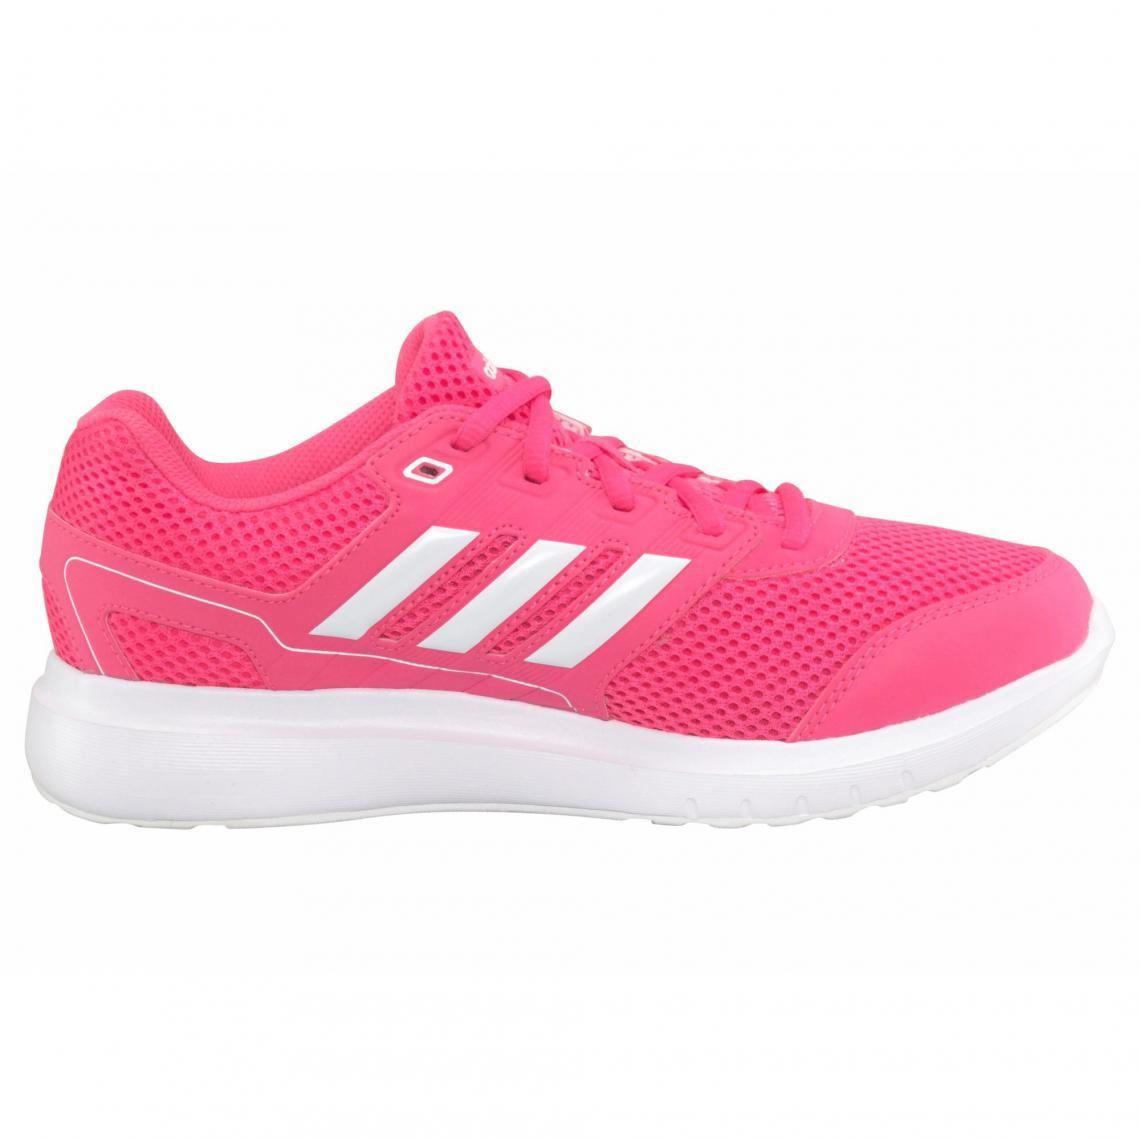 sports shoes 2a3ac 085f7 Sneakers Adidas Cliquez limage pour lagrandir. adidas Performance Duramo  Lite 2.0 chaussures de running femme - Rose ...